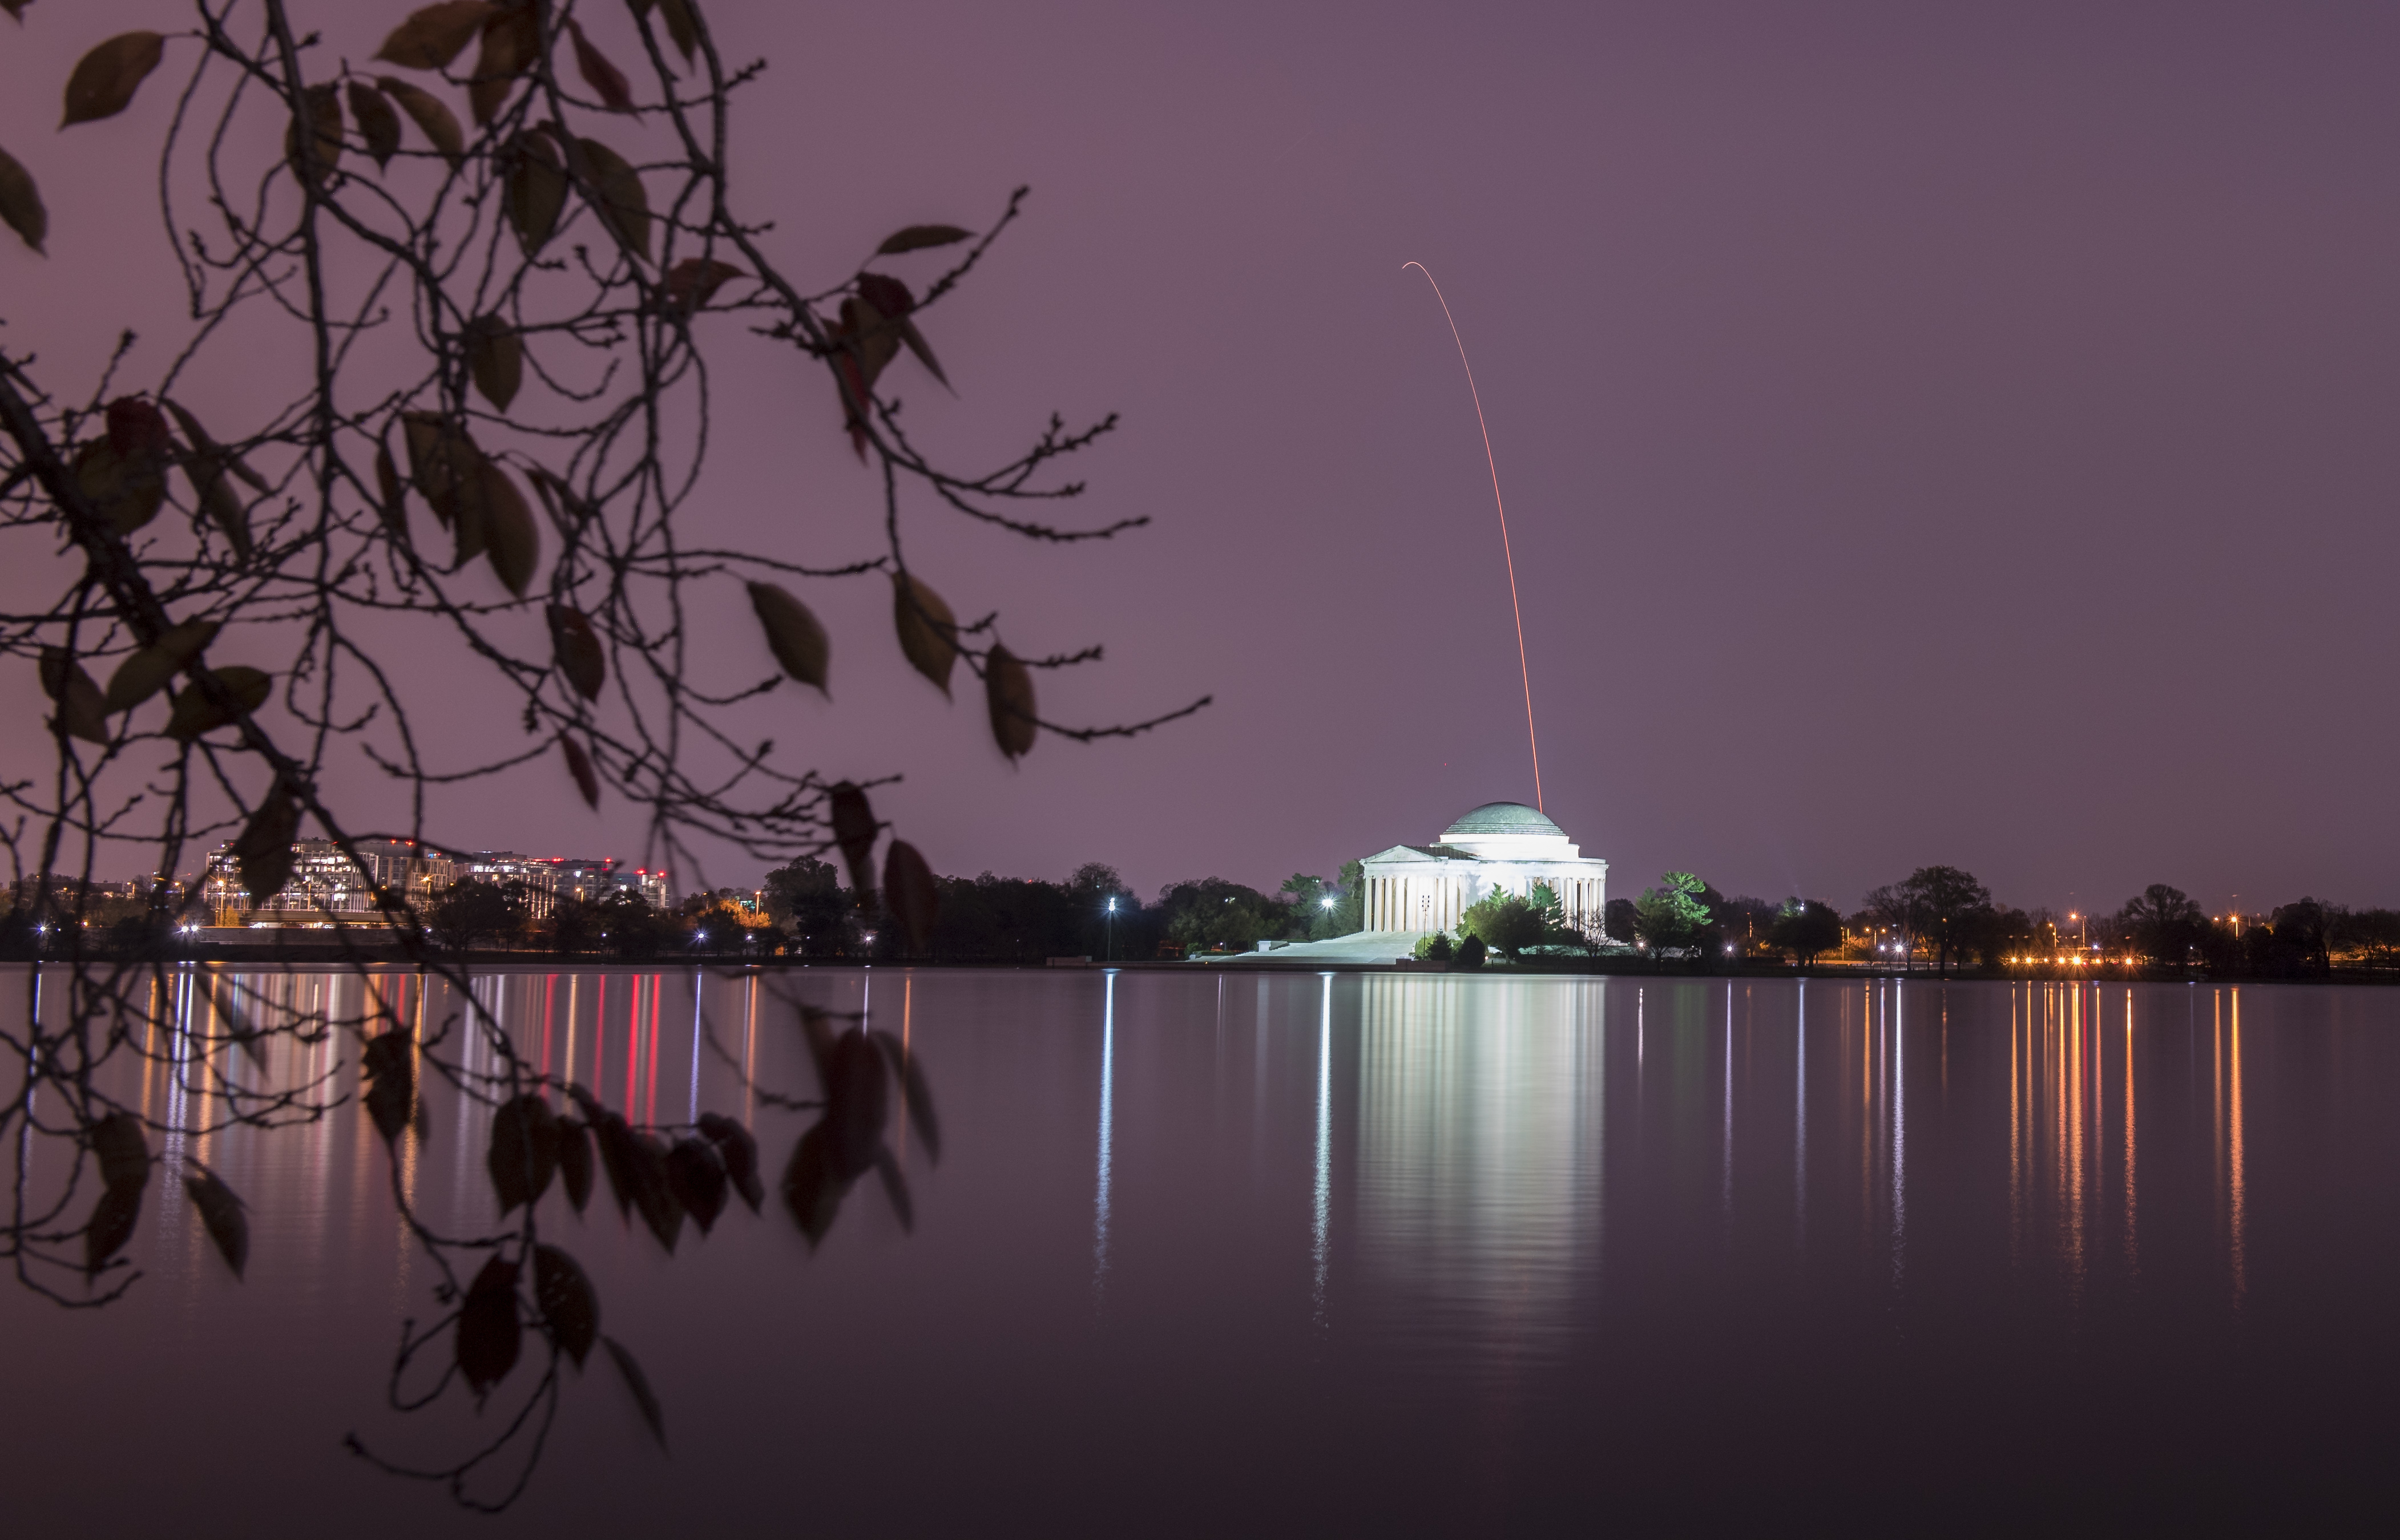 Antares Seen from Washington D.C. Tidal Basin